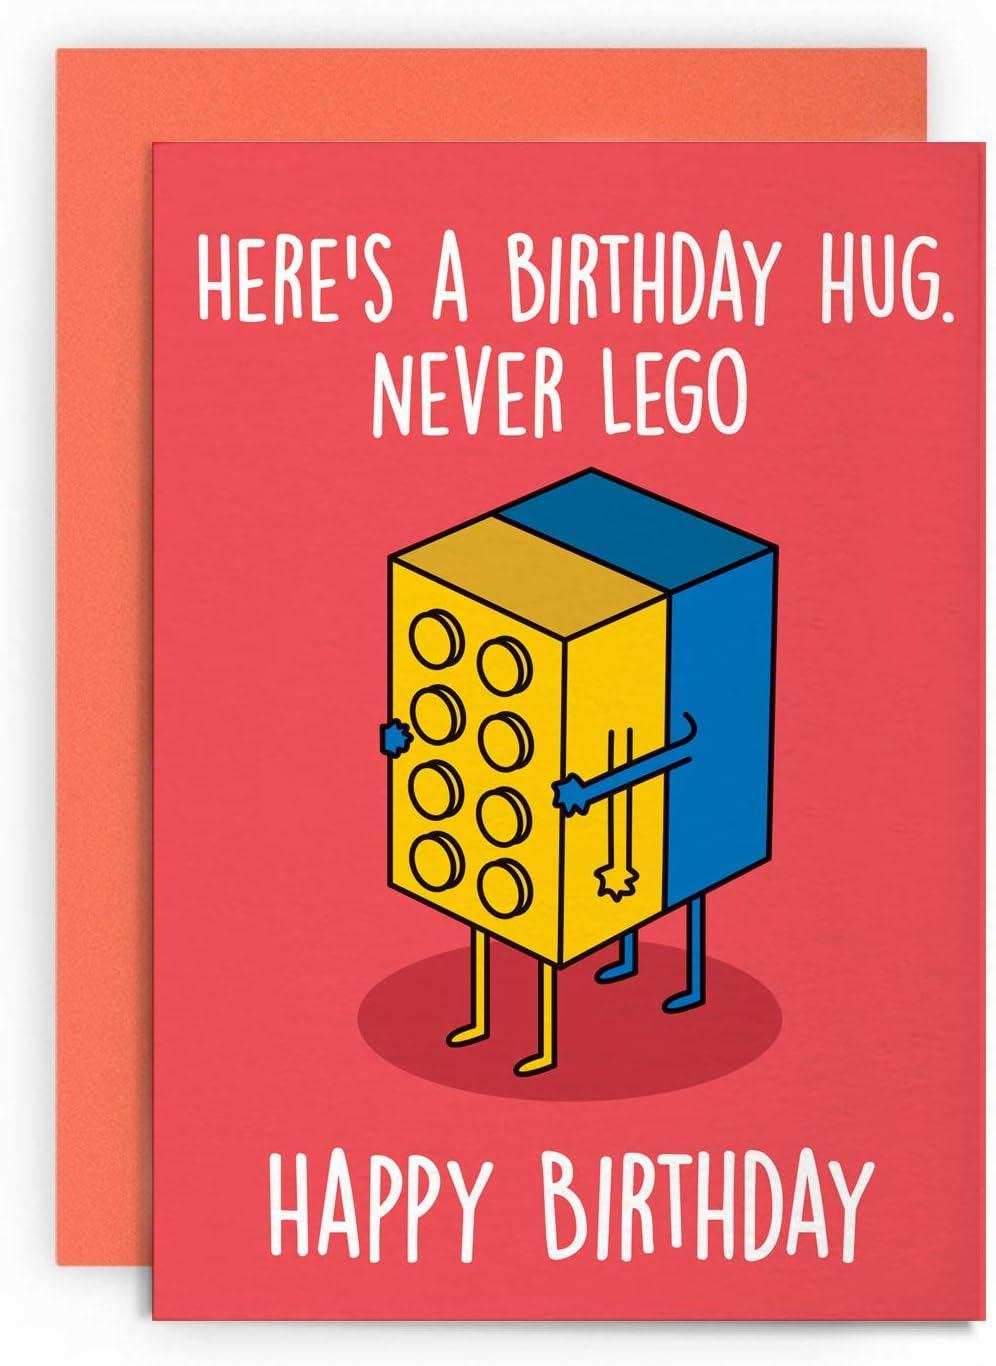 Birthday Card Funny Retro Toys Husband Wife Boyfriend Girlfriend Friend Mum Dad Son Daughter Happy Greeting For Him Her Joke Lol Pun Birthday Hug Amazon Co Uk Office Products